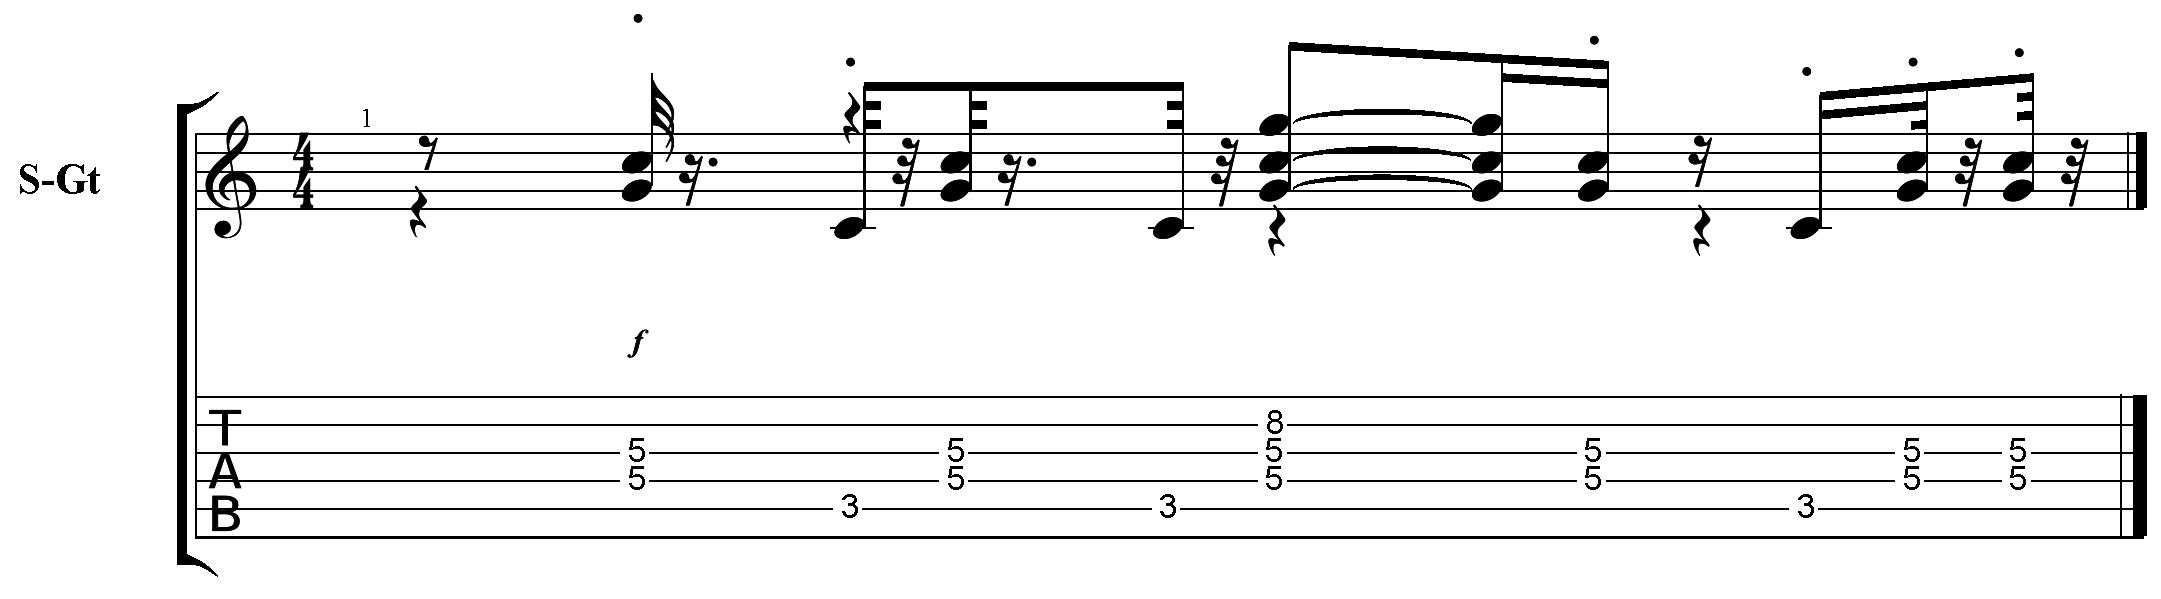 Guitar Pro] Incorrect beaming | MuseScore